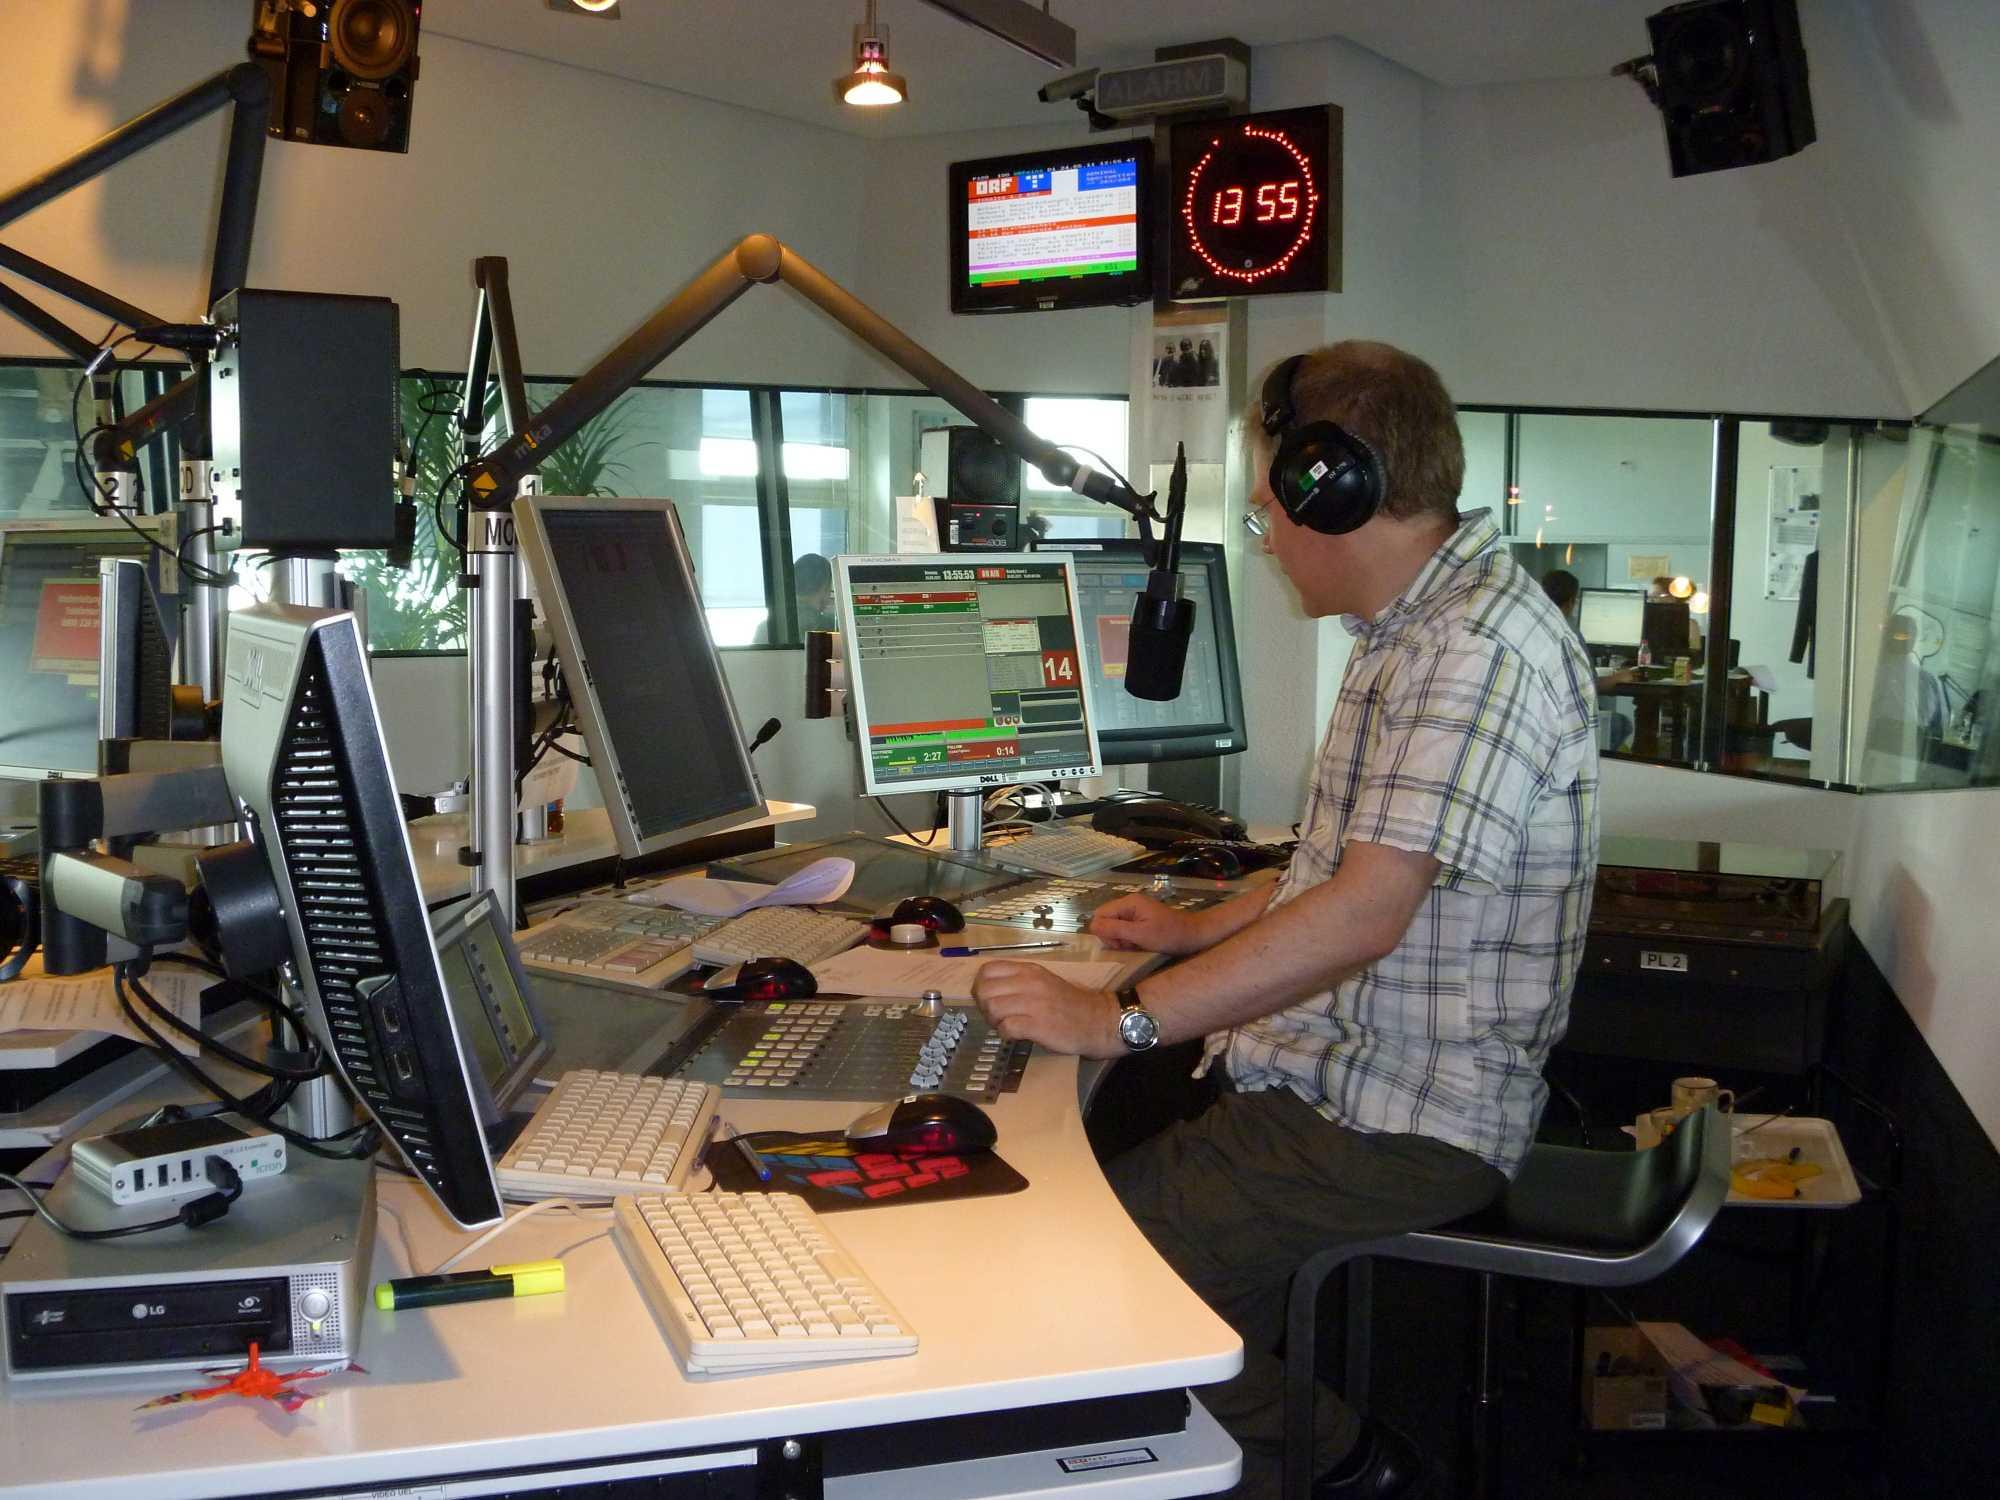 Modernes Radiostudio mit Moderator